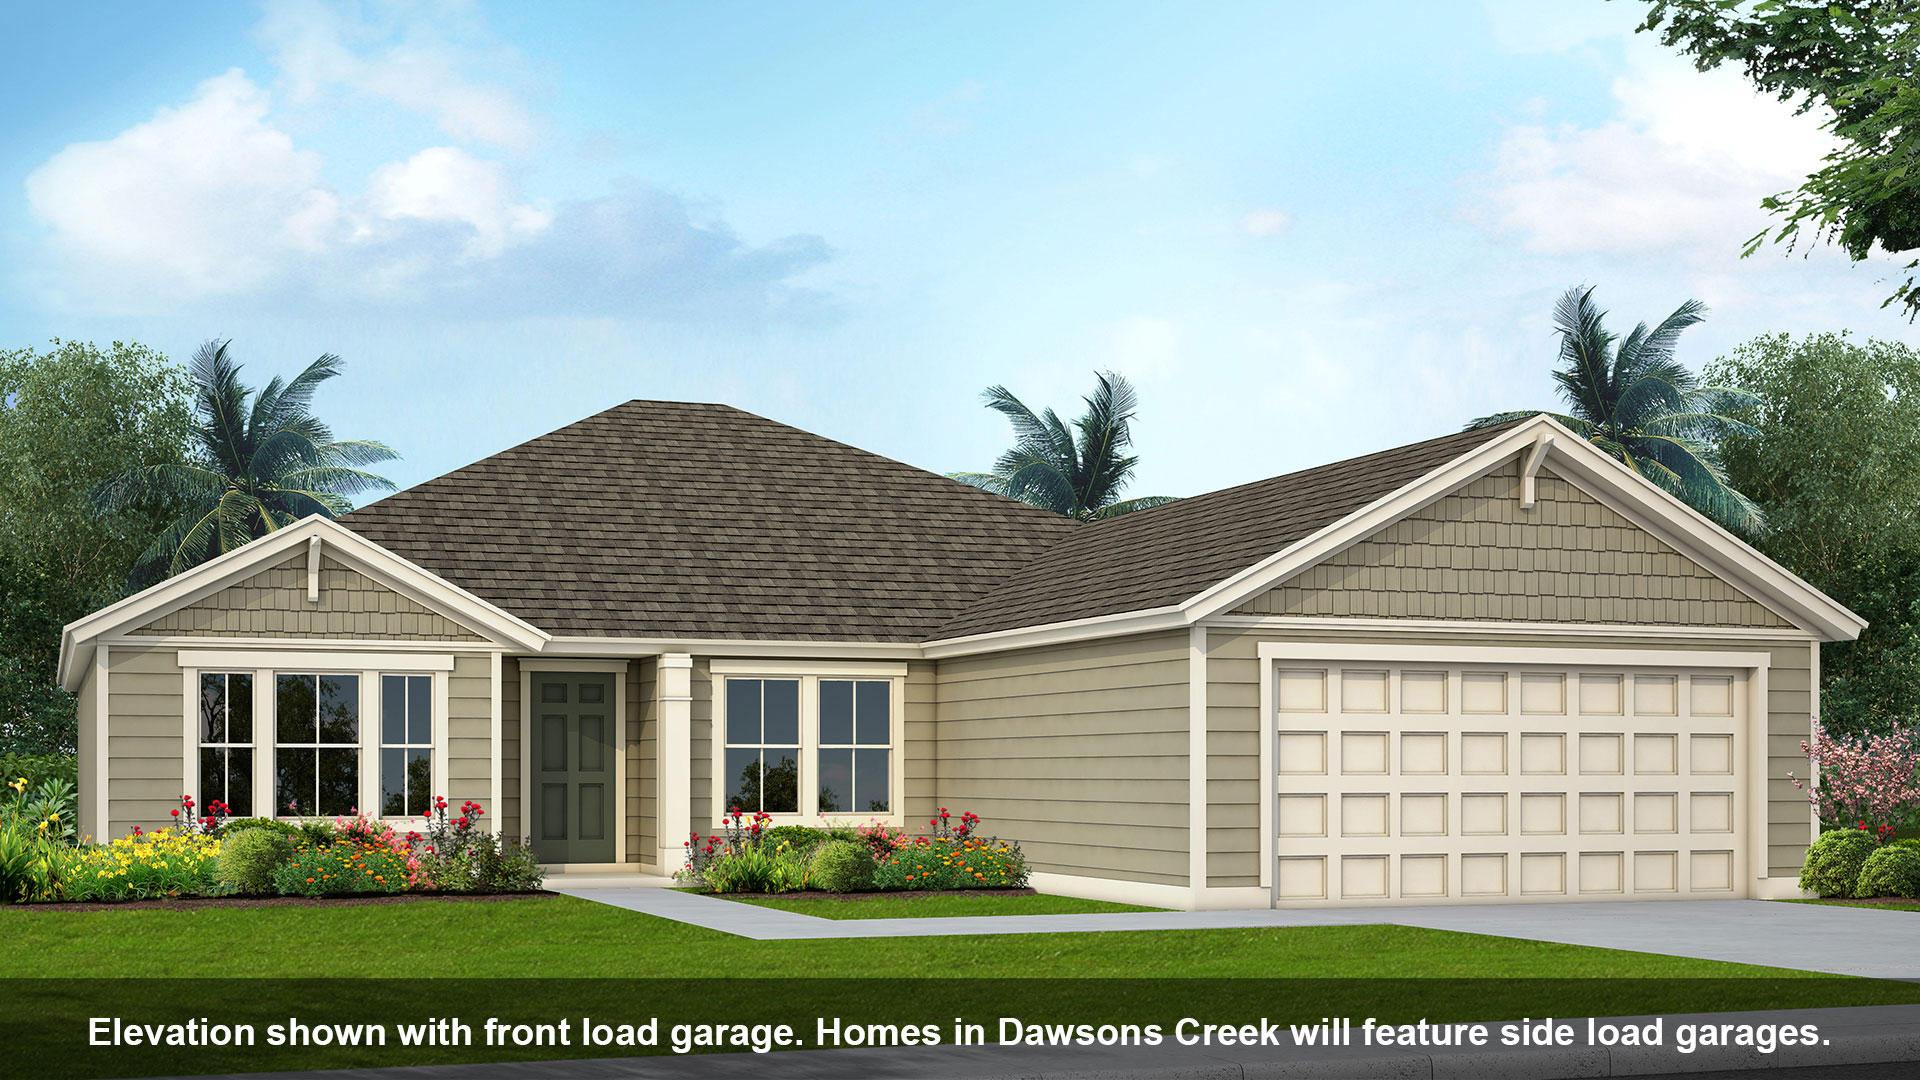 11606 Paceys Pond Cir, Jacksonville, FL 32222 - 4 Bed, 2 Bath Single-Family  Home | Trulia